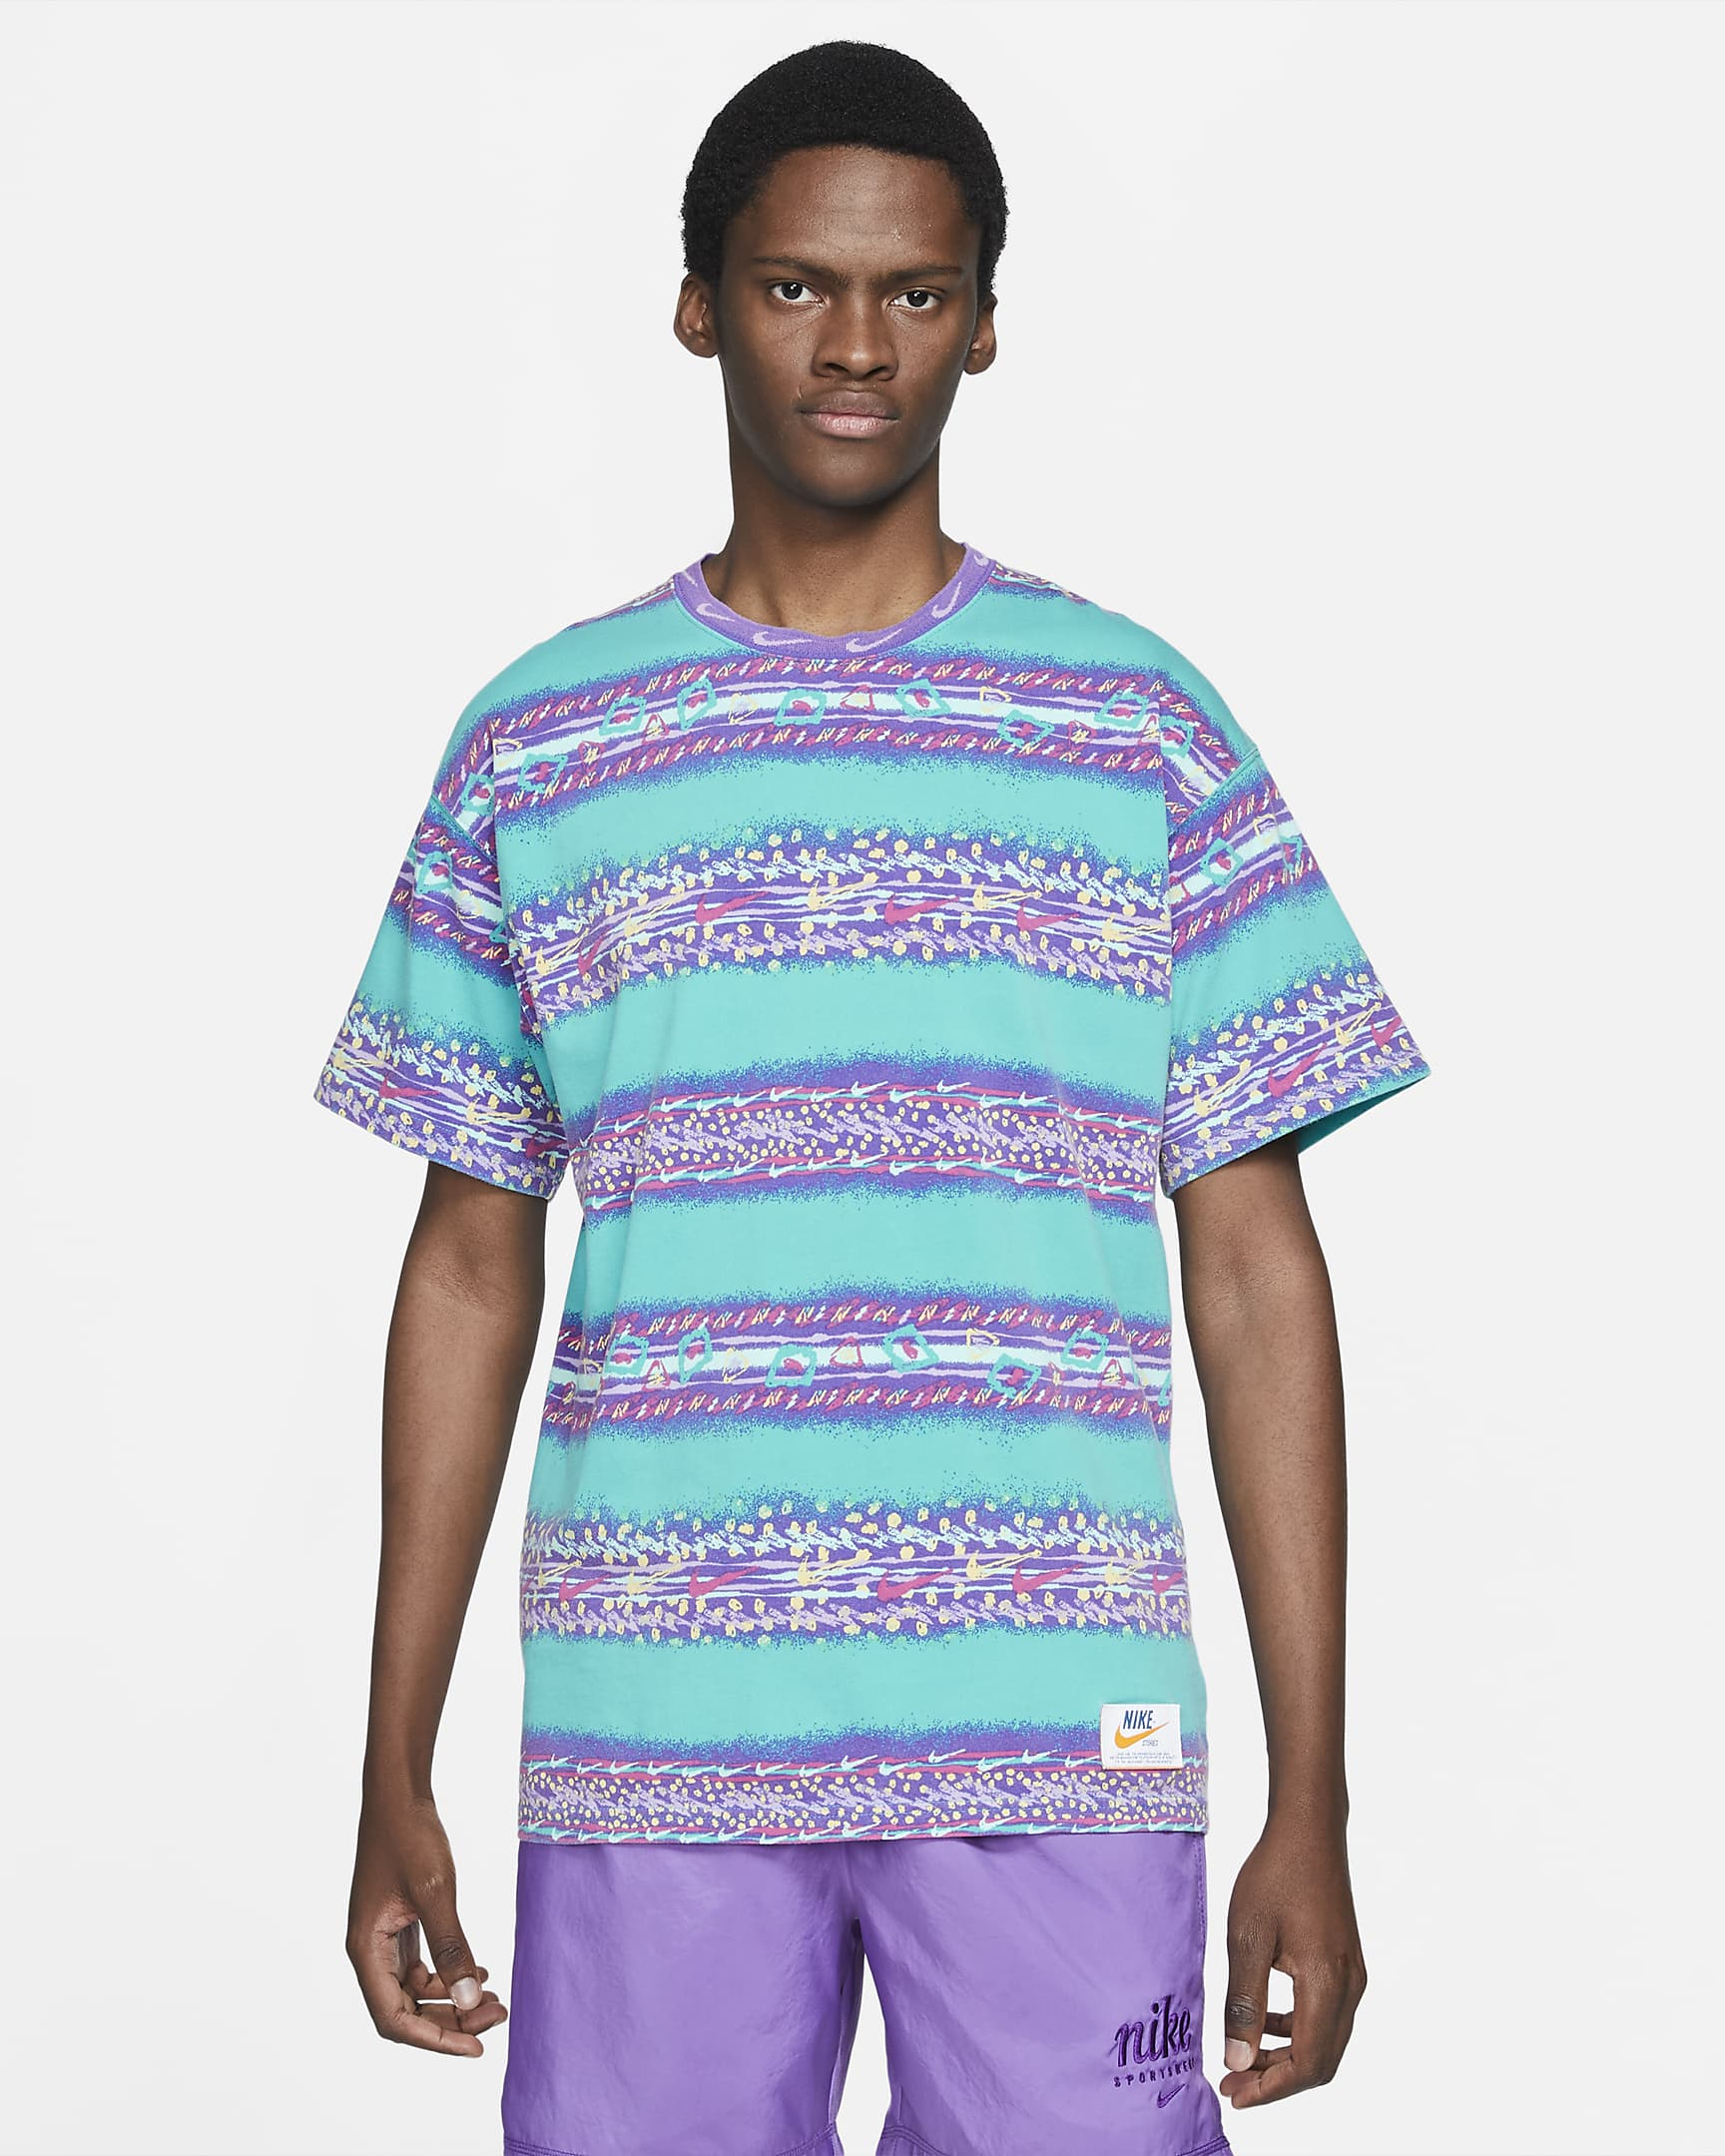 nike-sportswear-stories-mens-max-90-t-shirt-7vVnv1.png